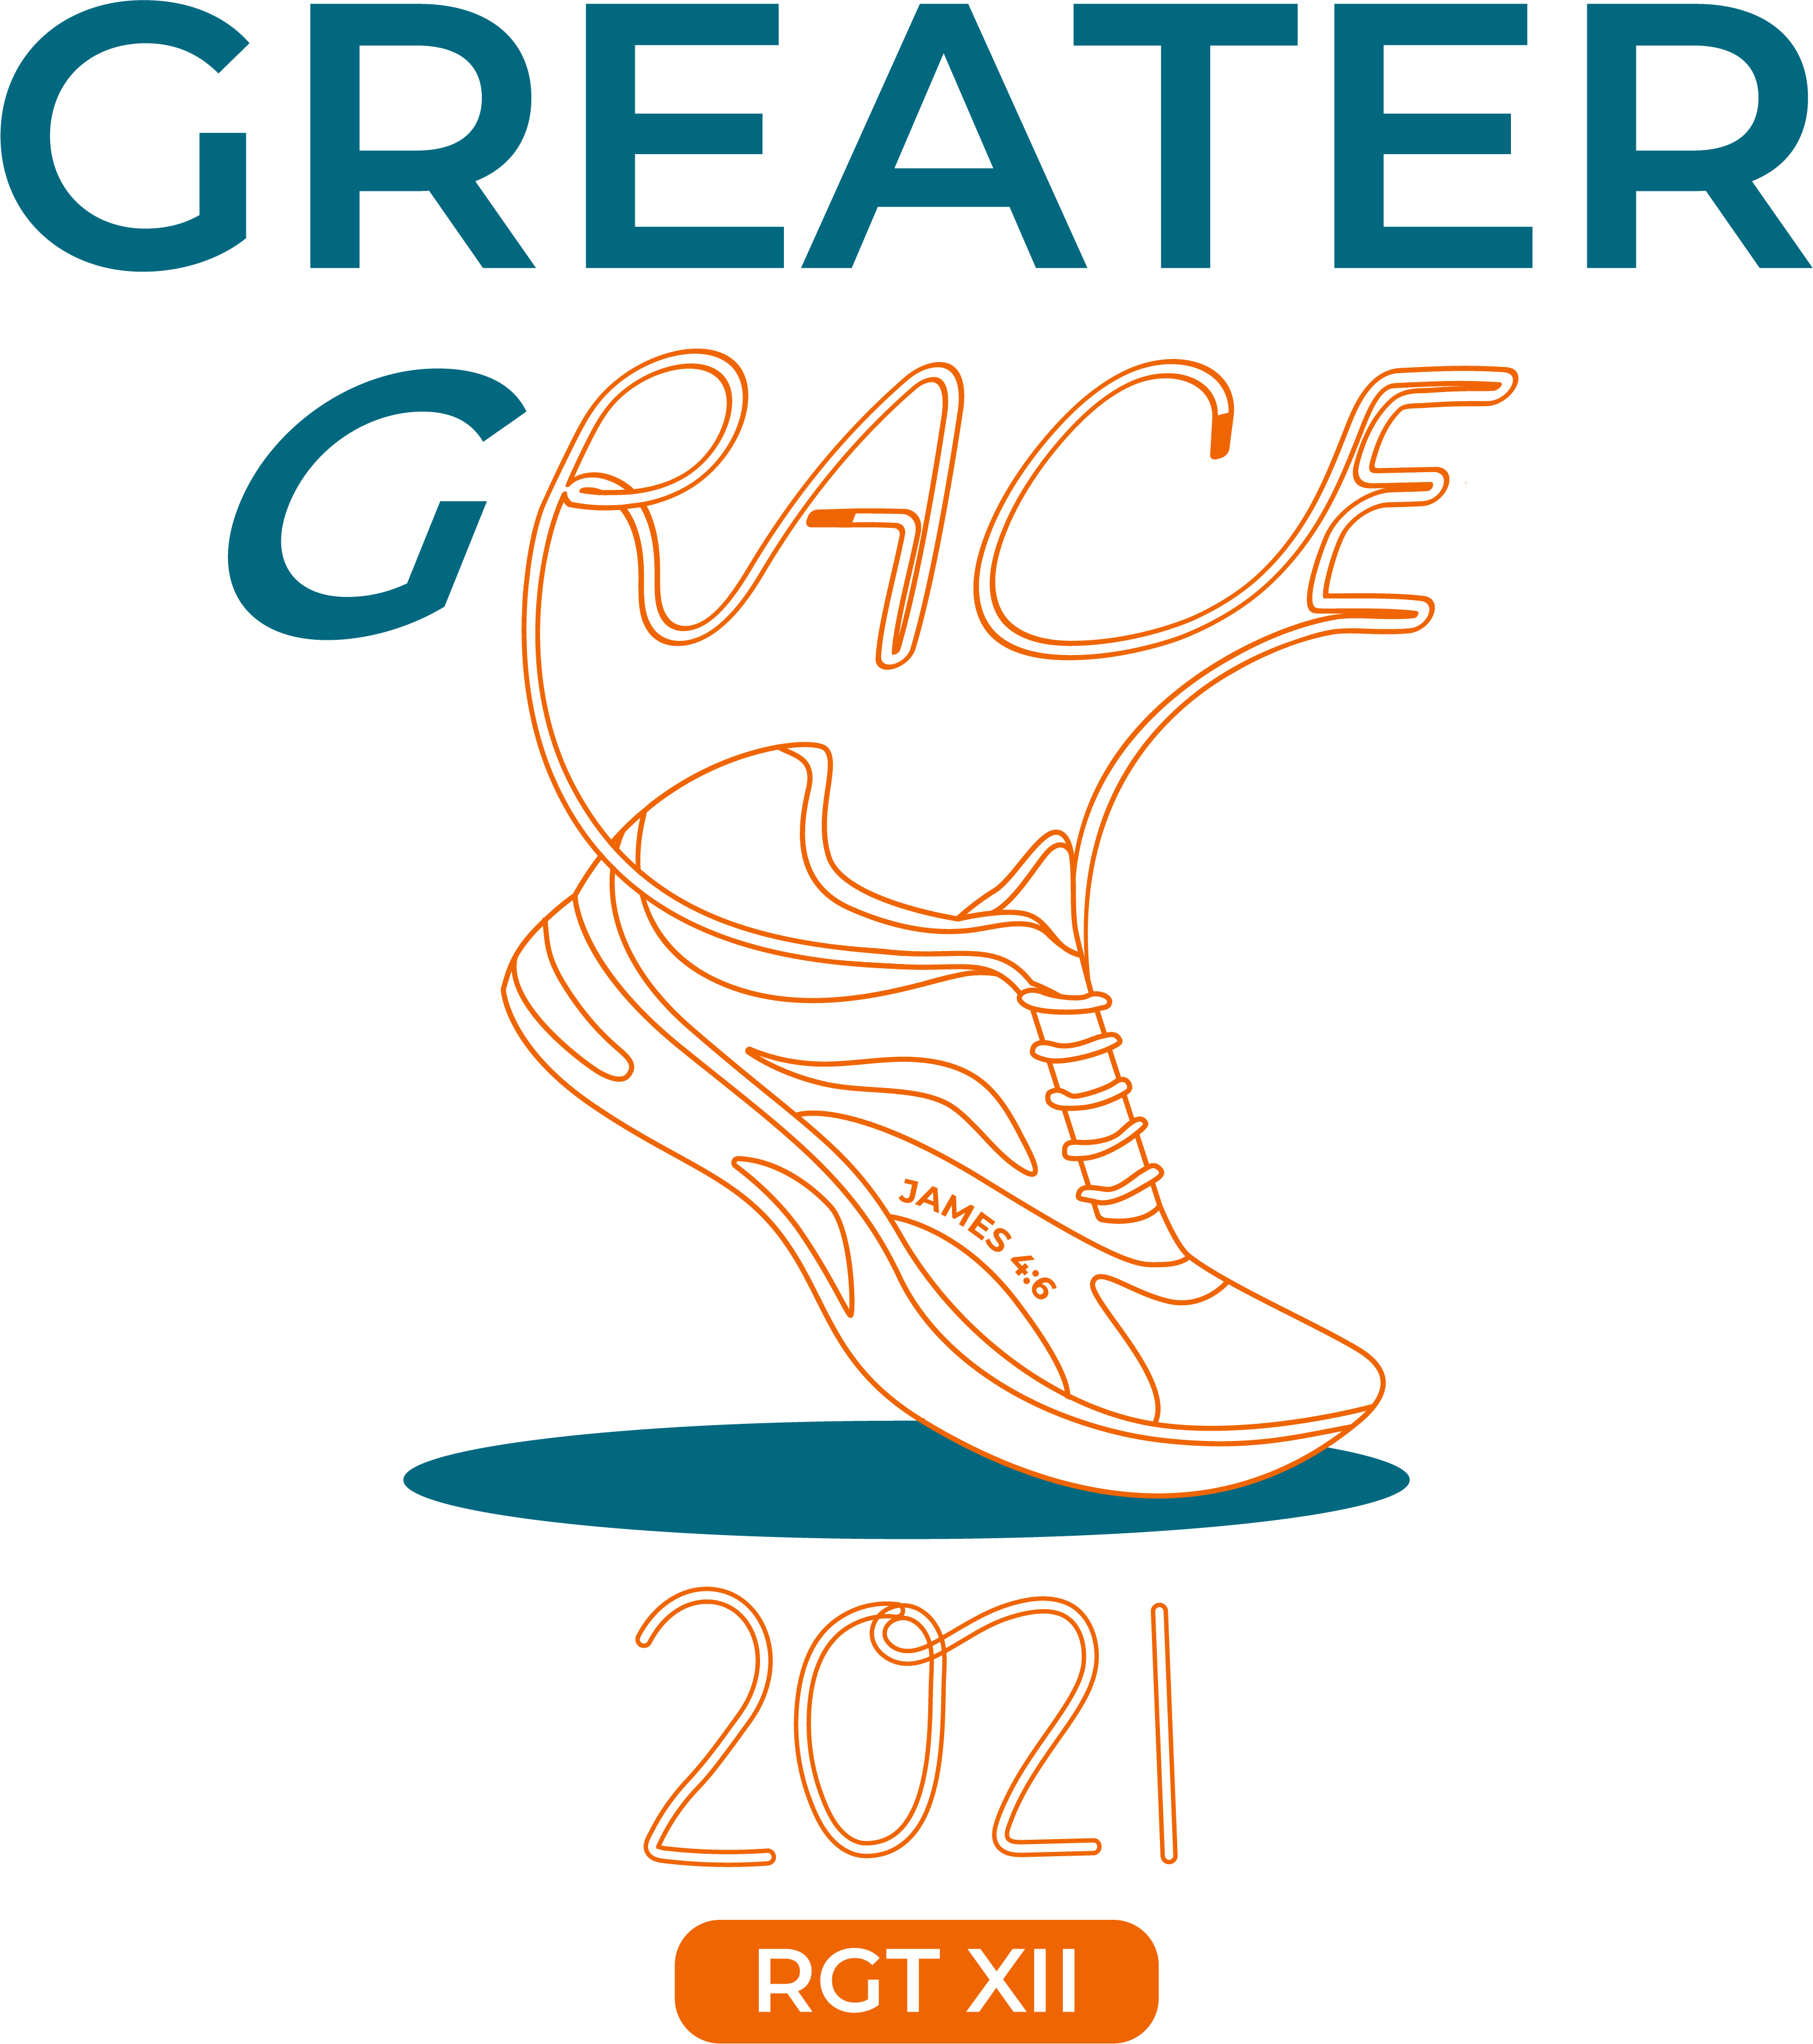 GREATERGRACE-16